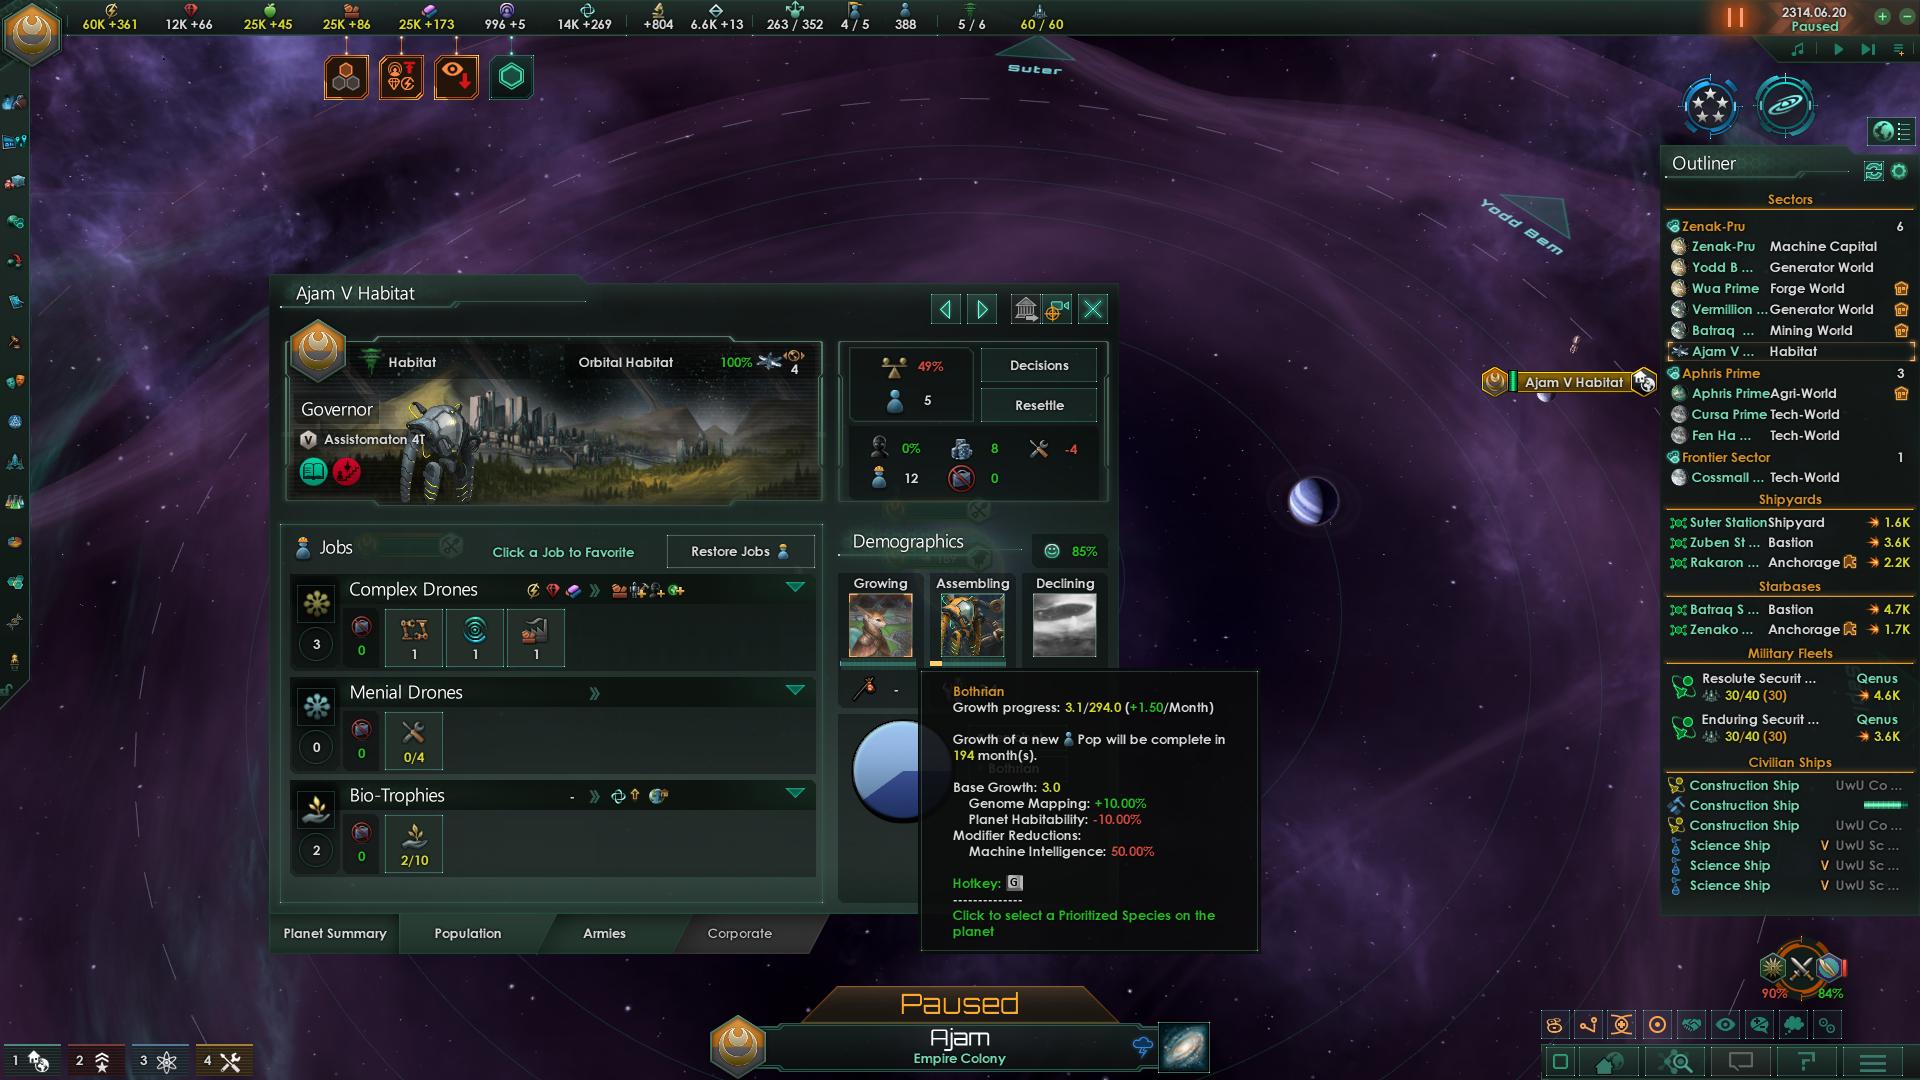 Stellaris_BothrianRun_HabitatPopGrowth.png